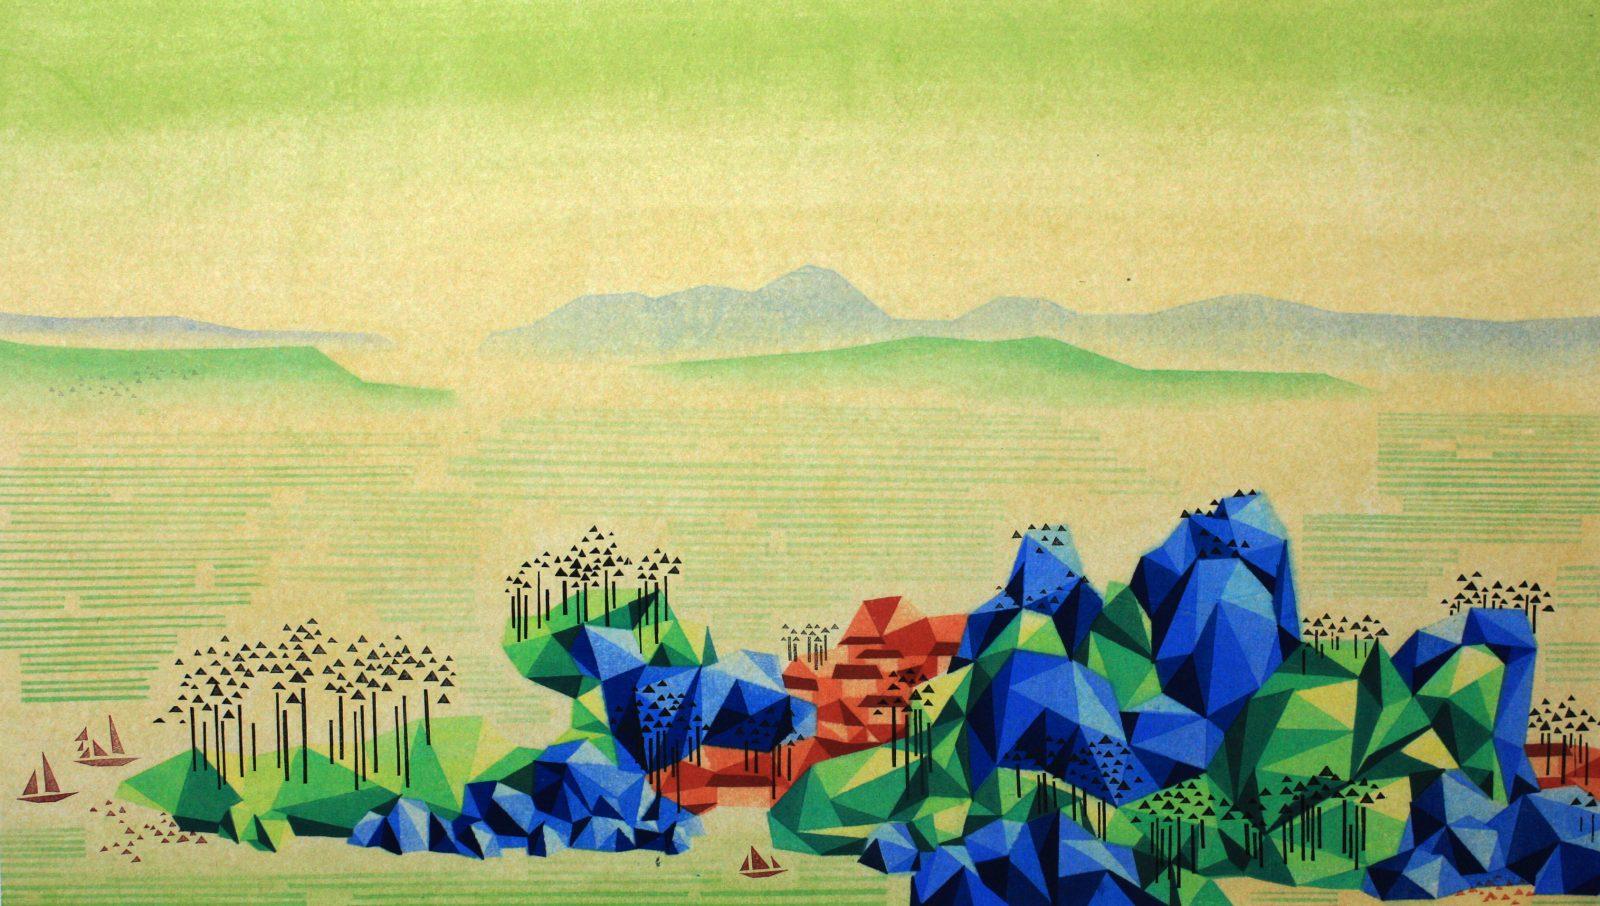 Reconstructed Landscape II《重构山水》-2,50cm×88cm 2014